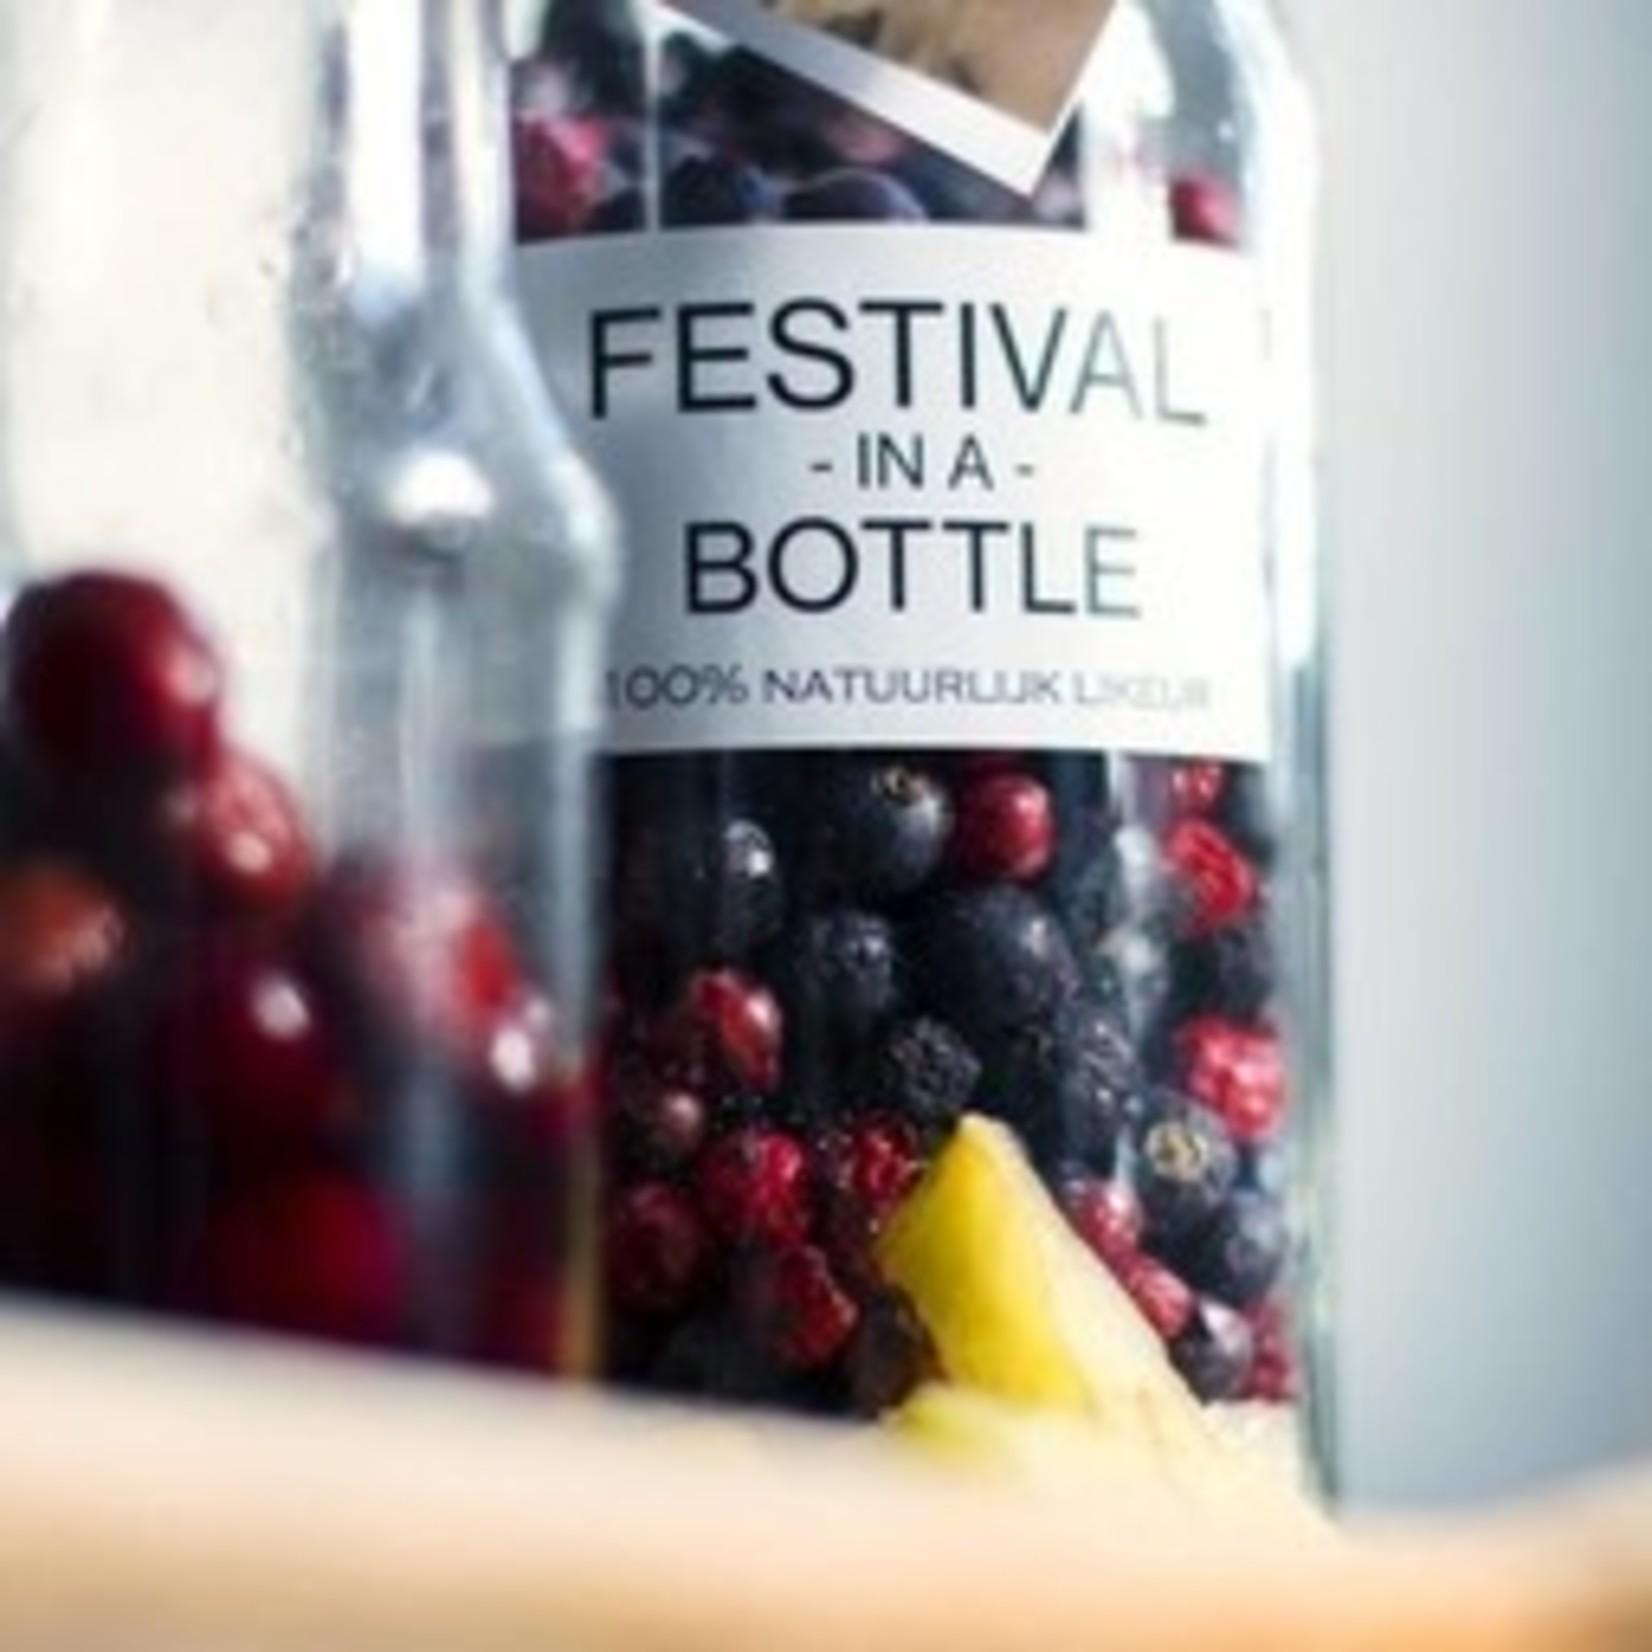 Festival in a bottle Gin festival